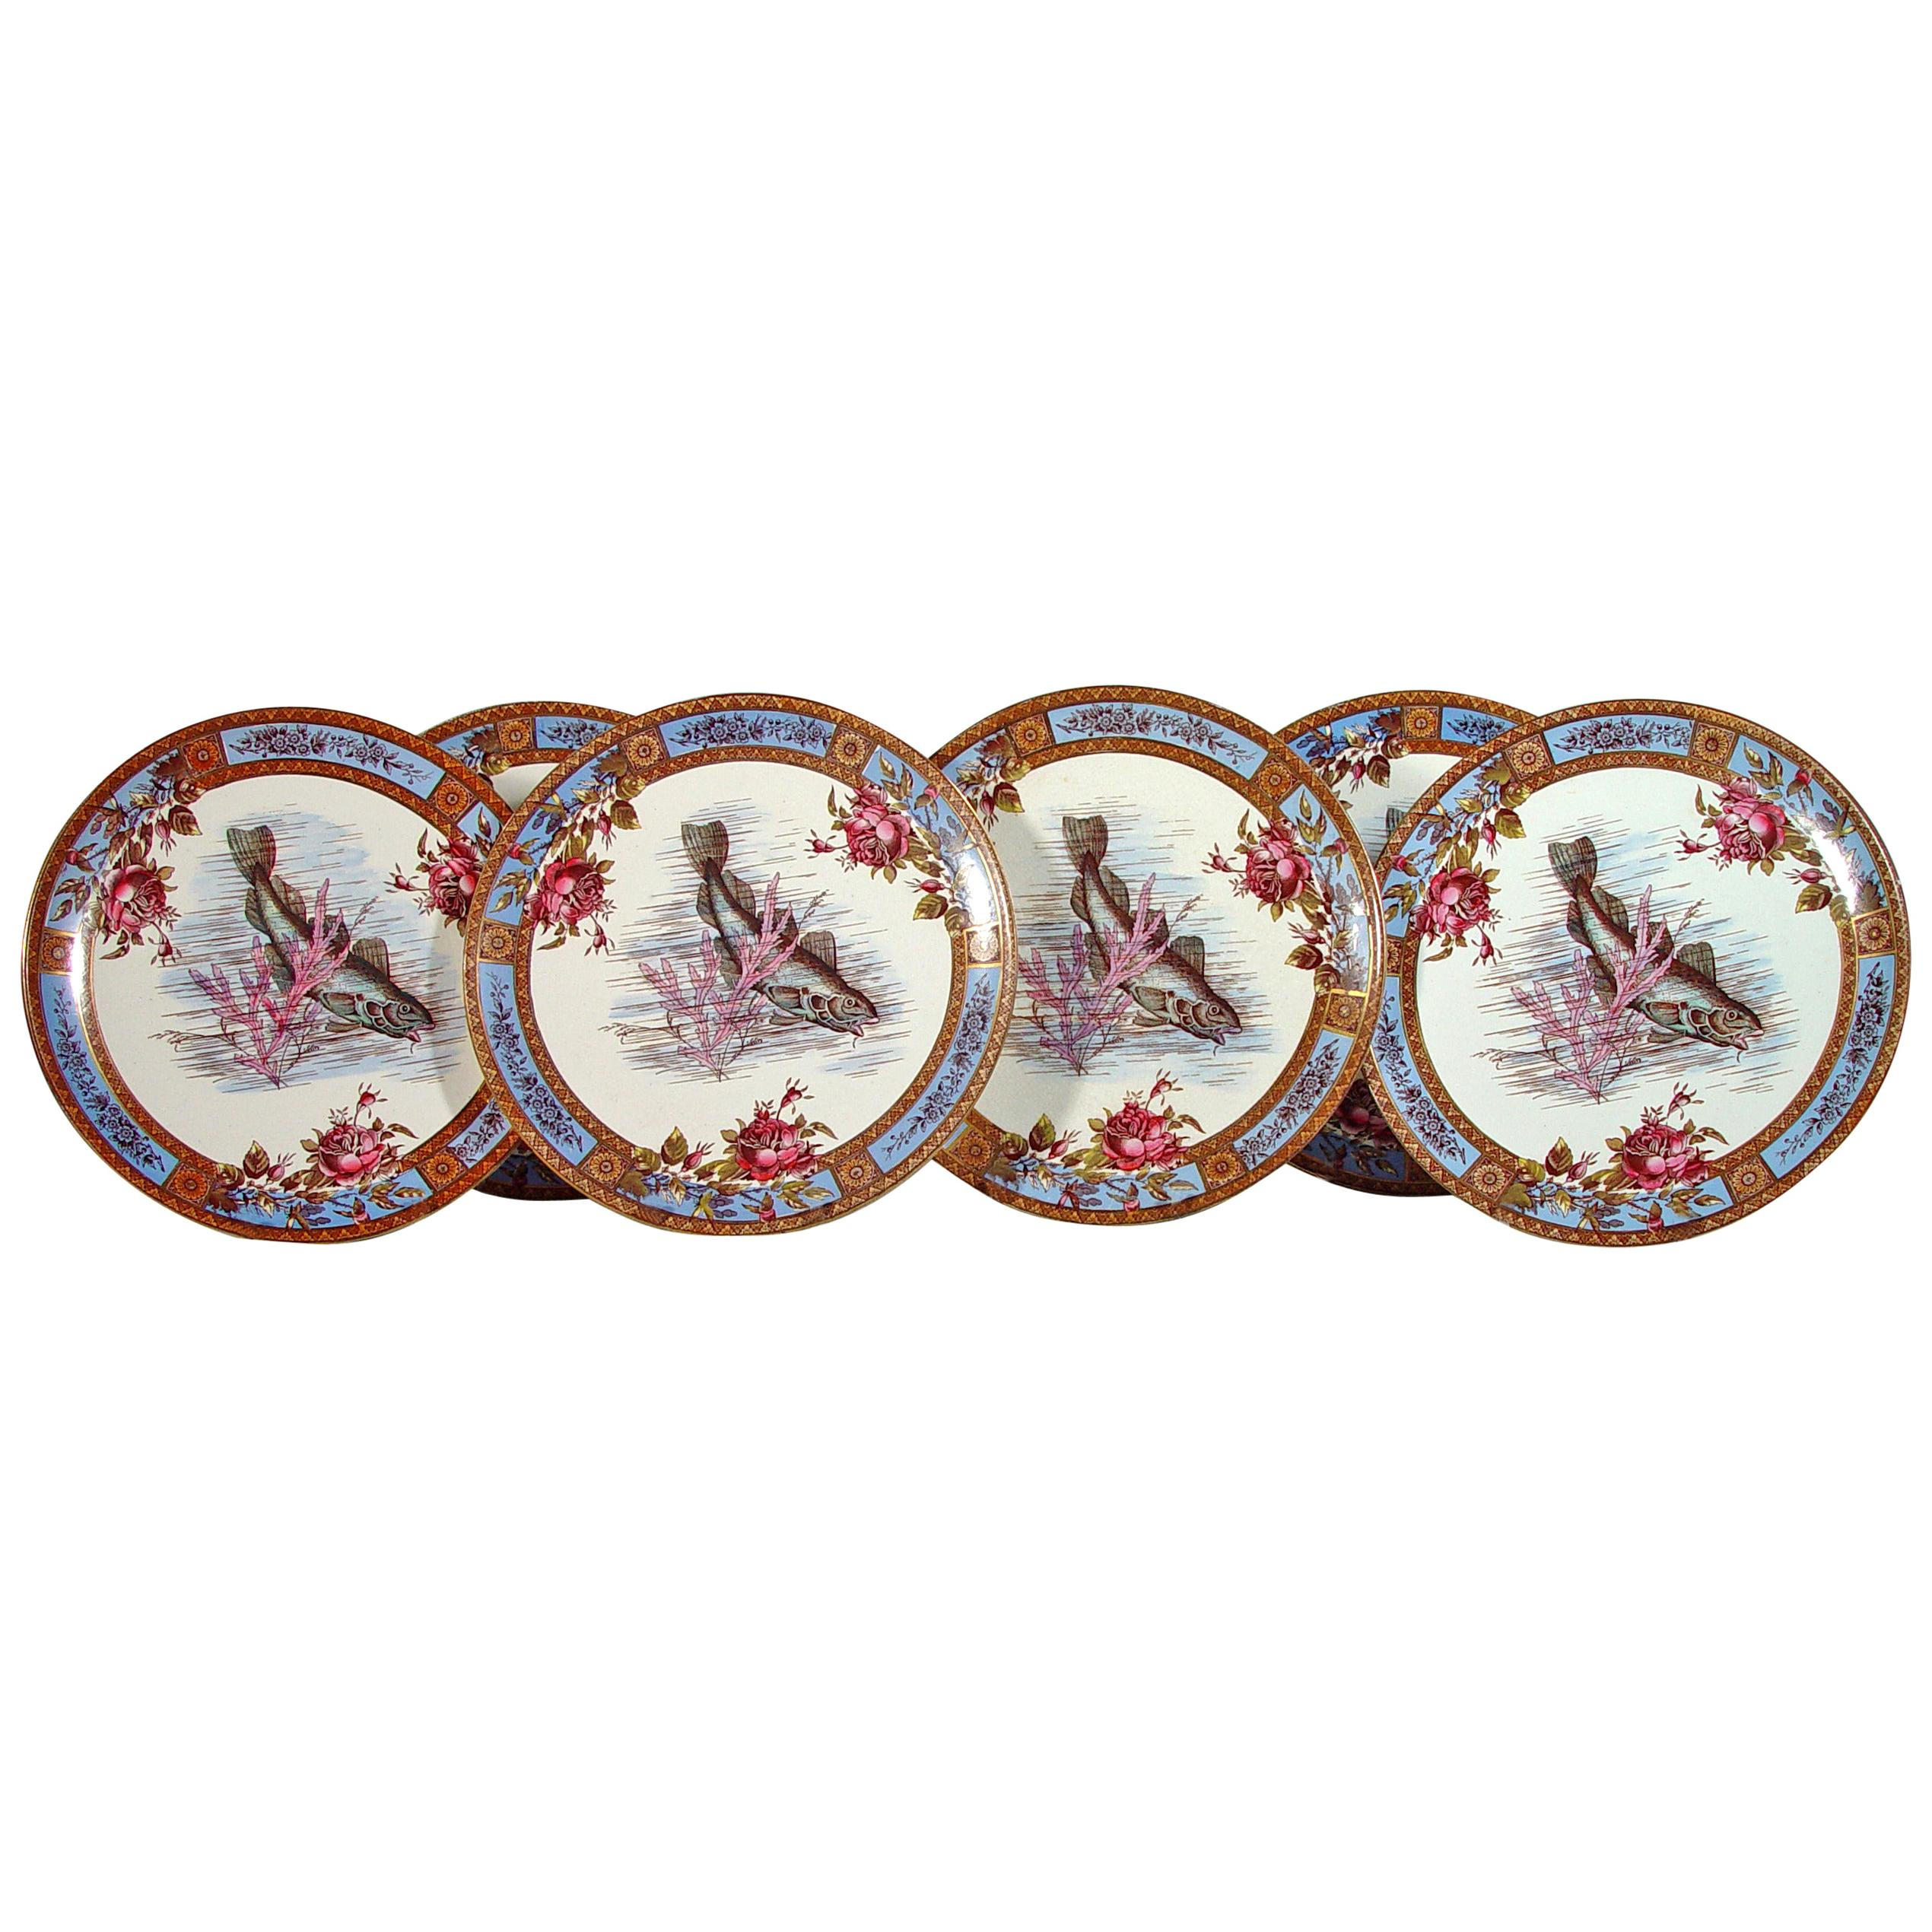 Six Garfield Pottery Earthenware Plates with Fish, Wood & Hulme